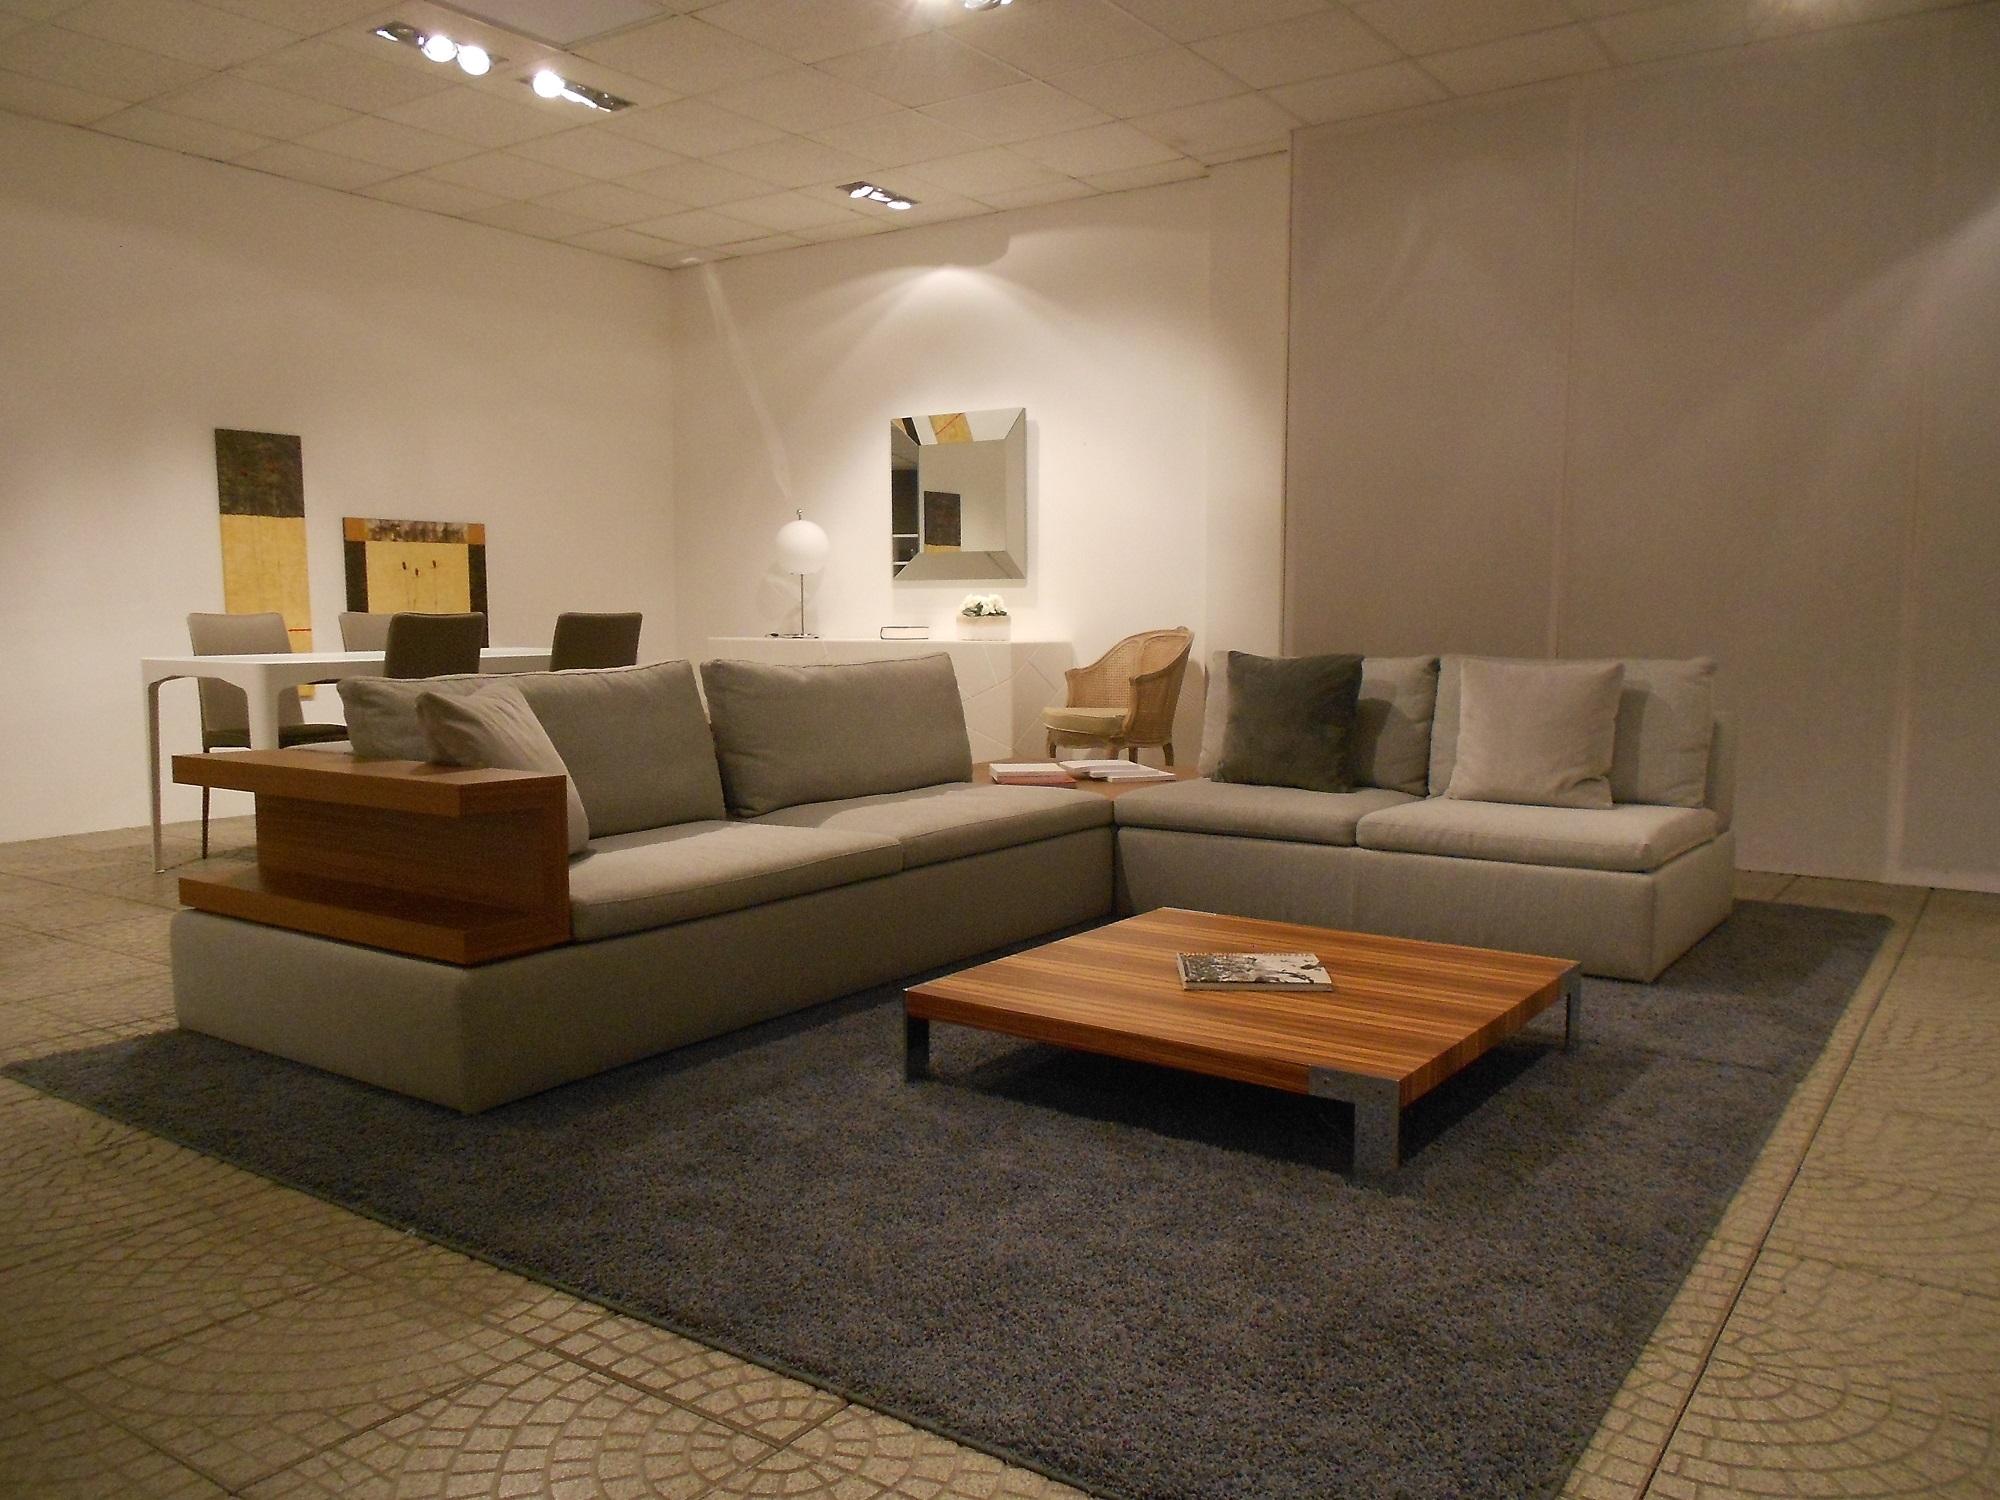 Jesse divano terence divano angolare tessuto divani a for Divano angolare tessuto prezzi